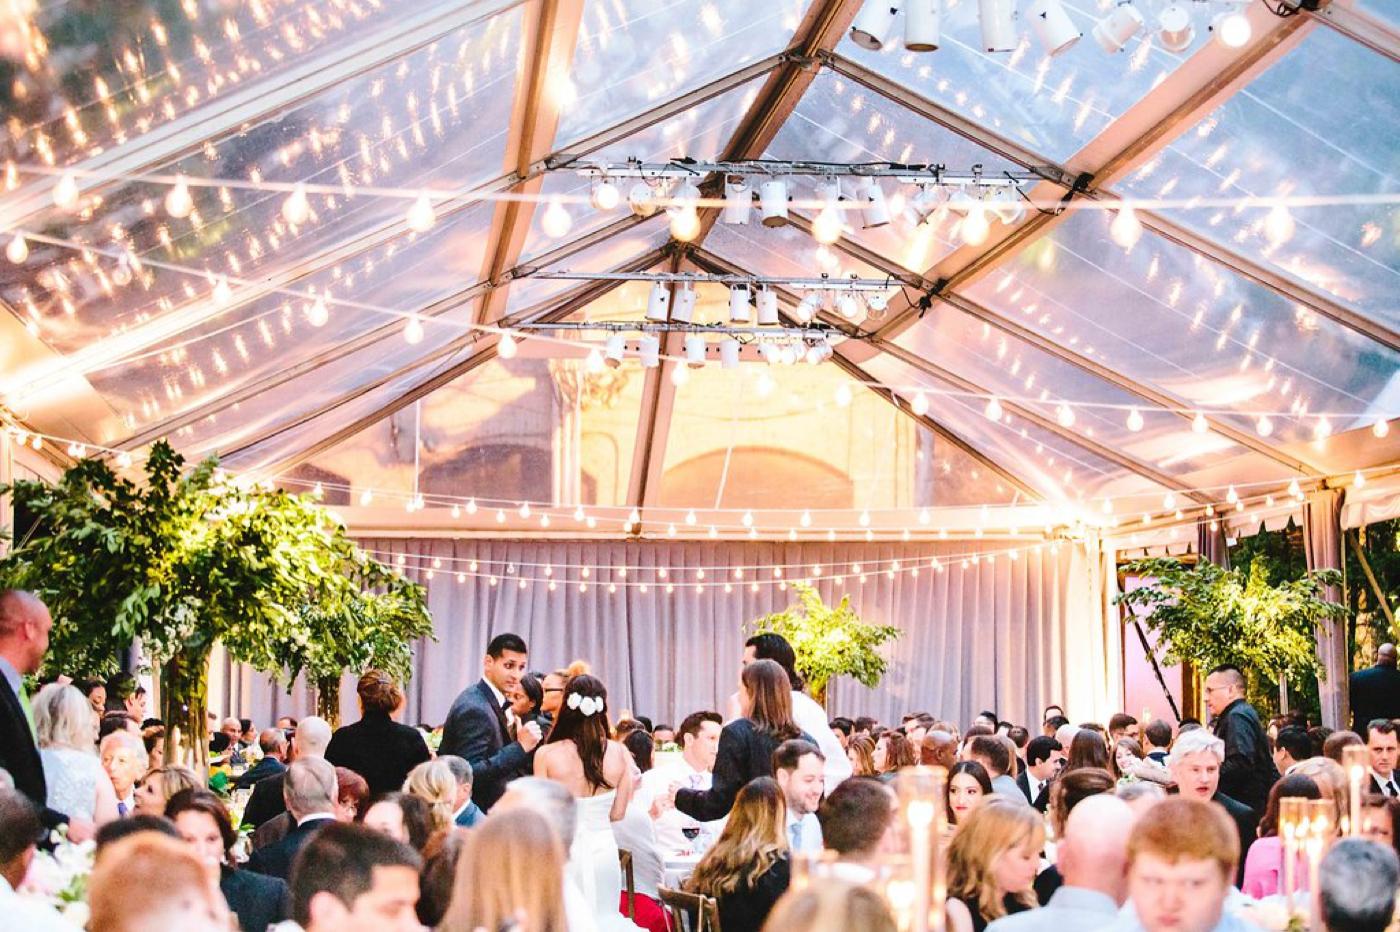 chicago-fine-art-wedding-photography-sakamuri82